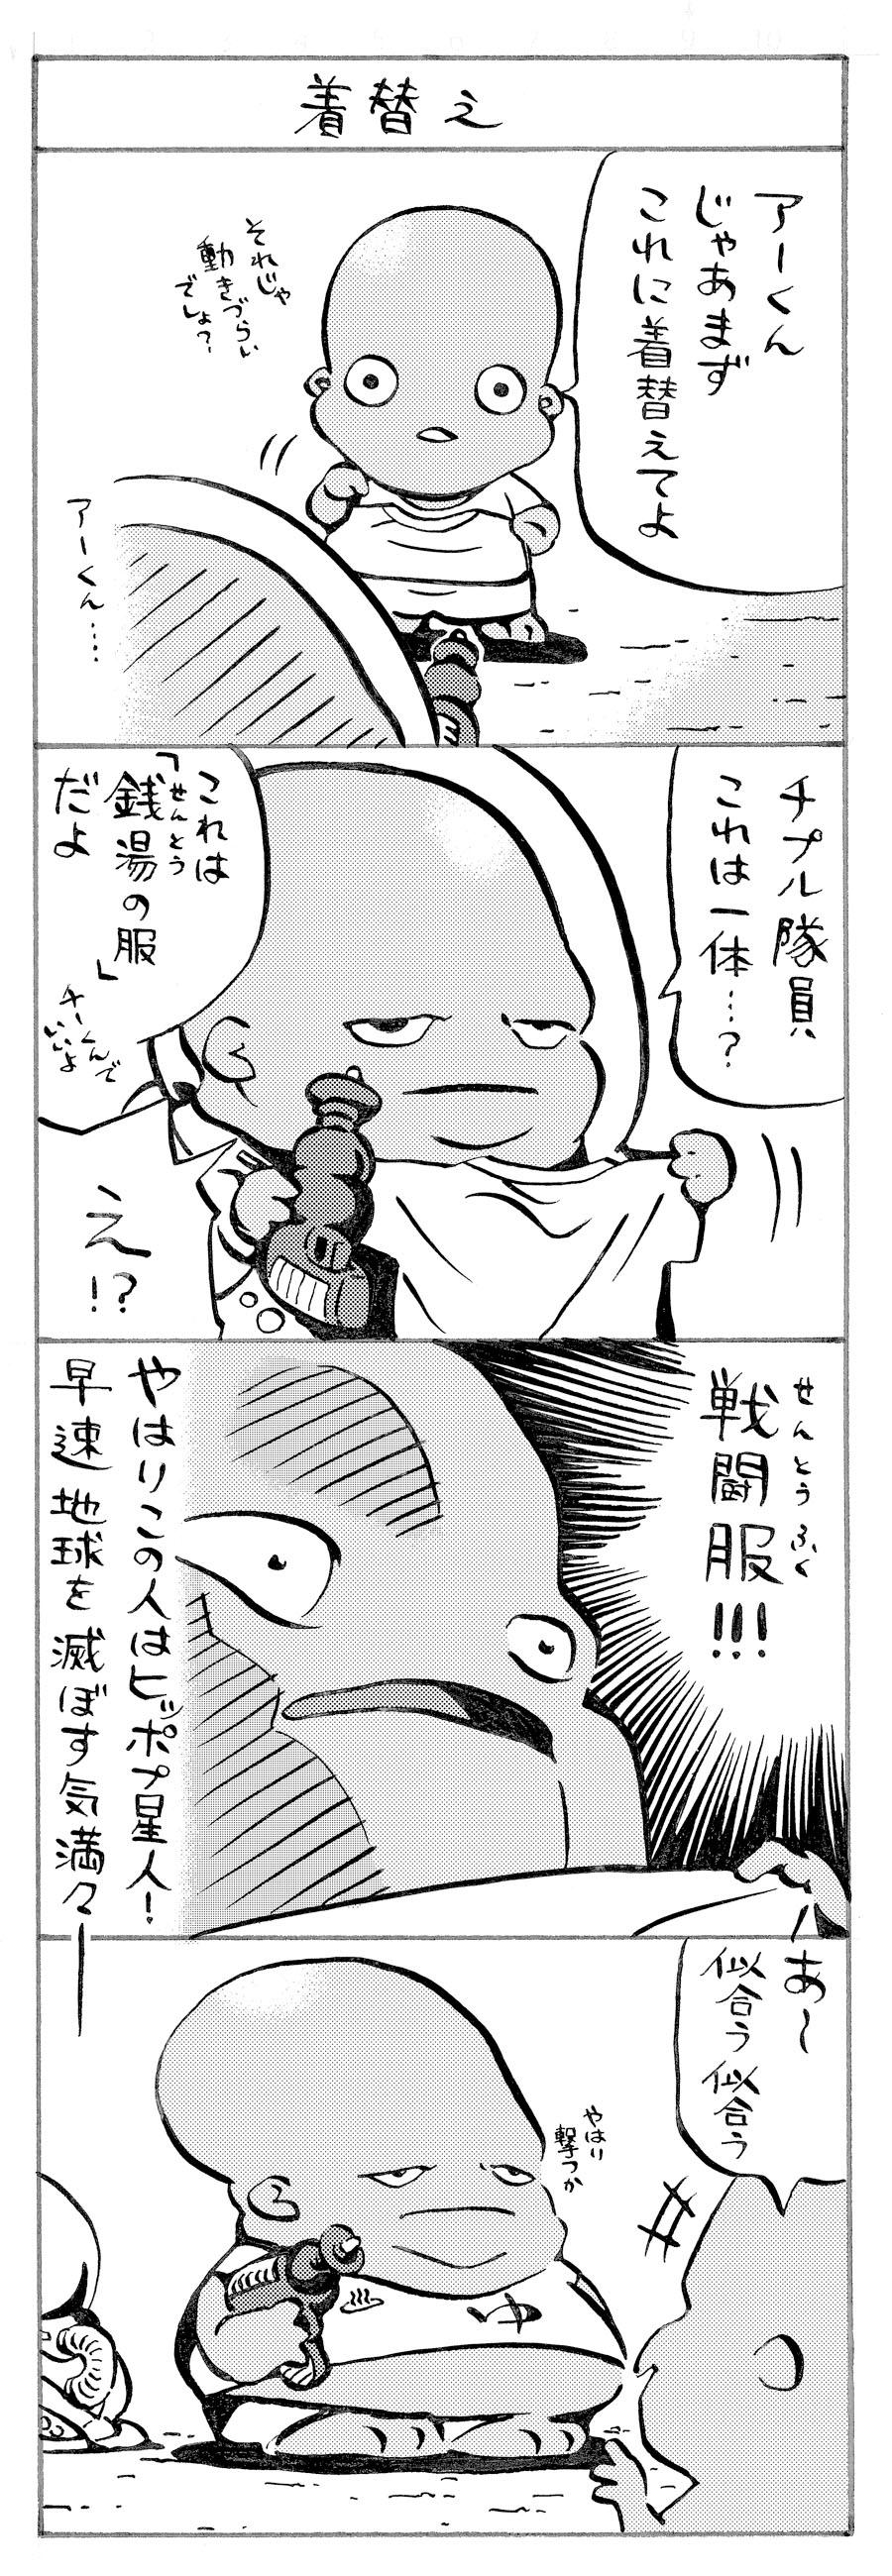 hippseijin_manga_03